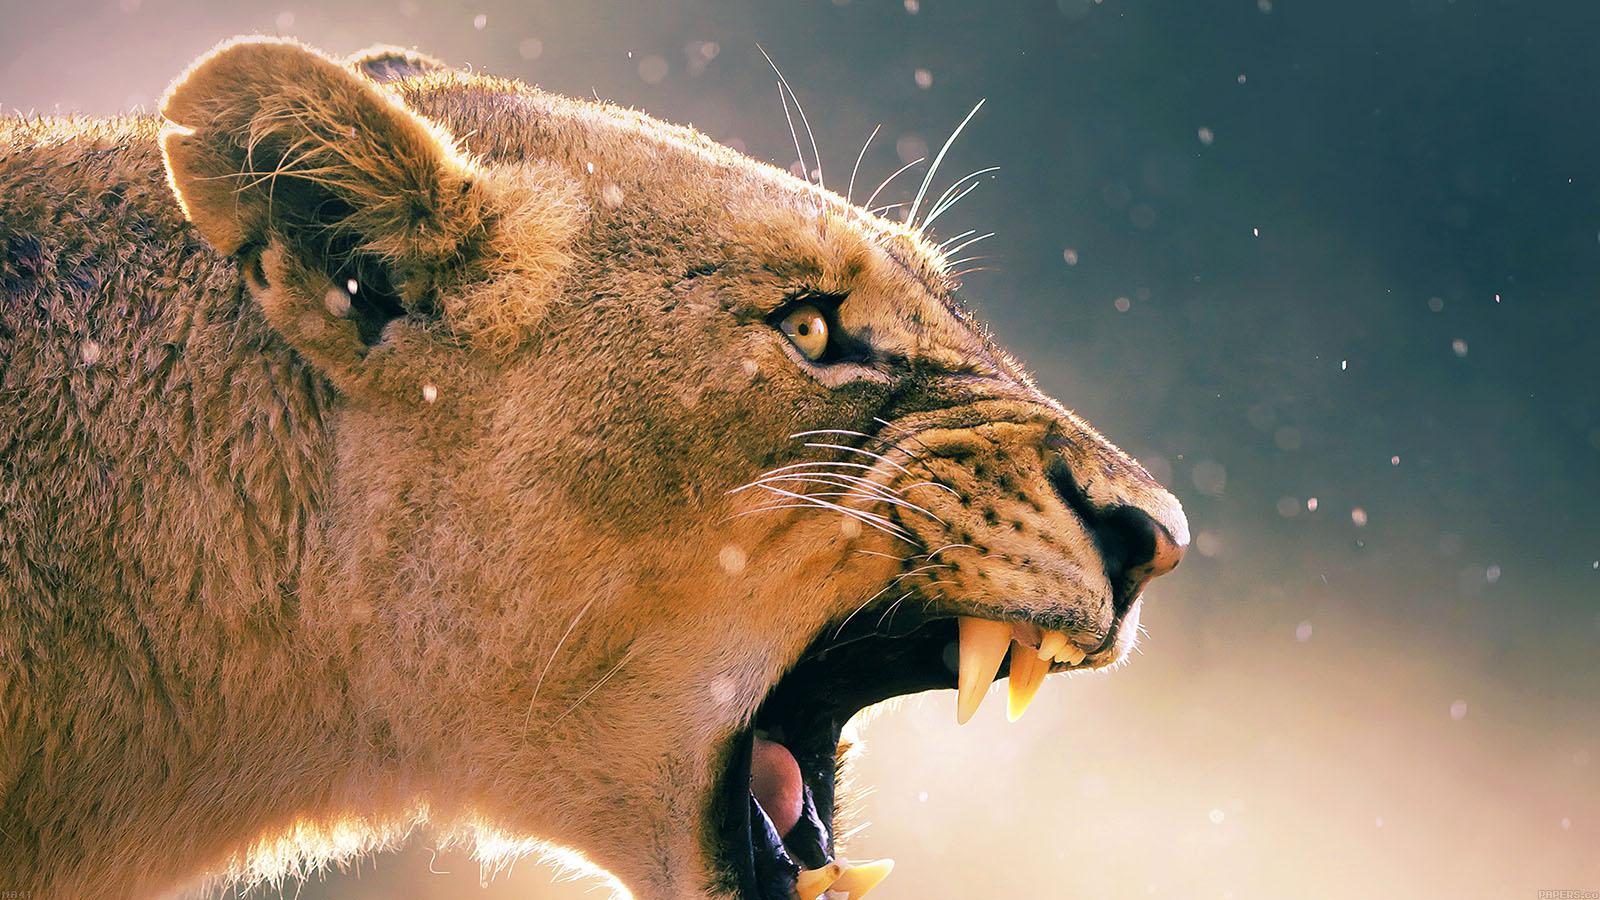 Hd Animal Wallpapers Wild Life Animal Desktop Images: Ma41-angry-lion-one-animal-nature